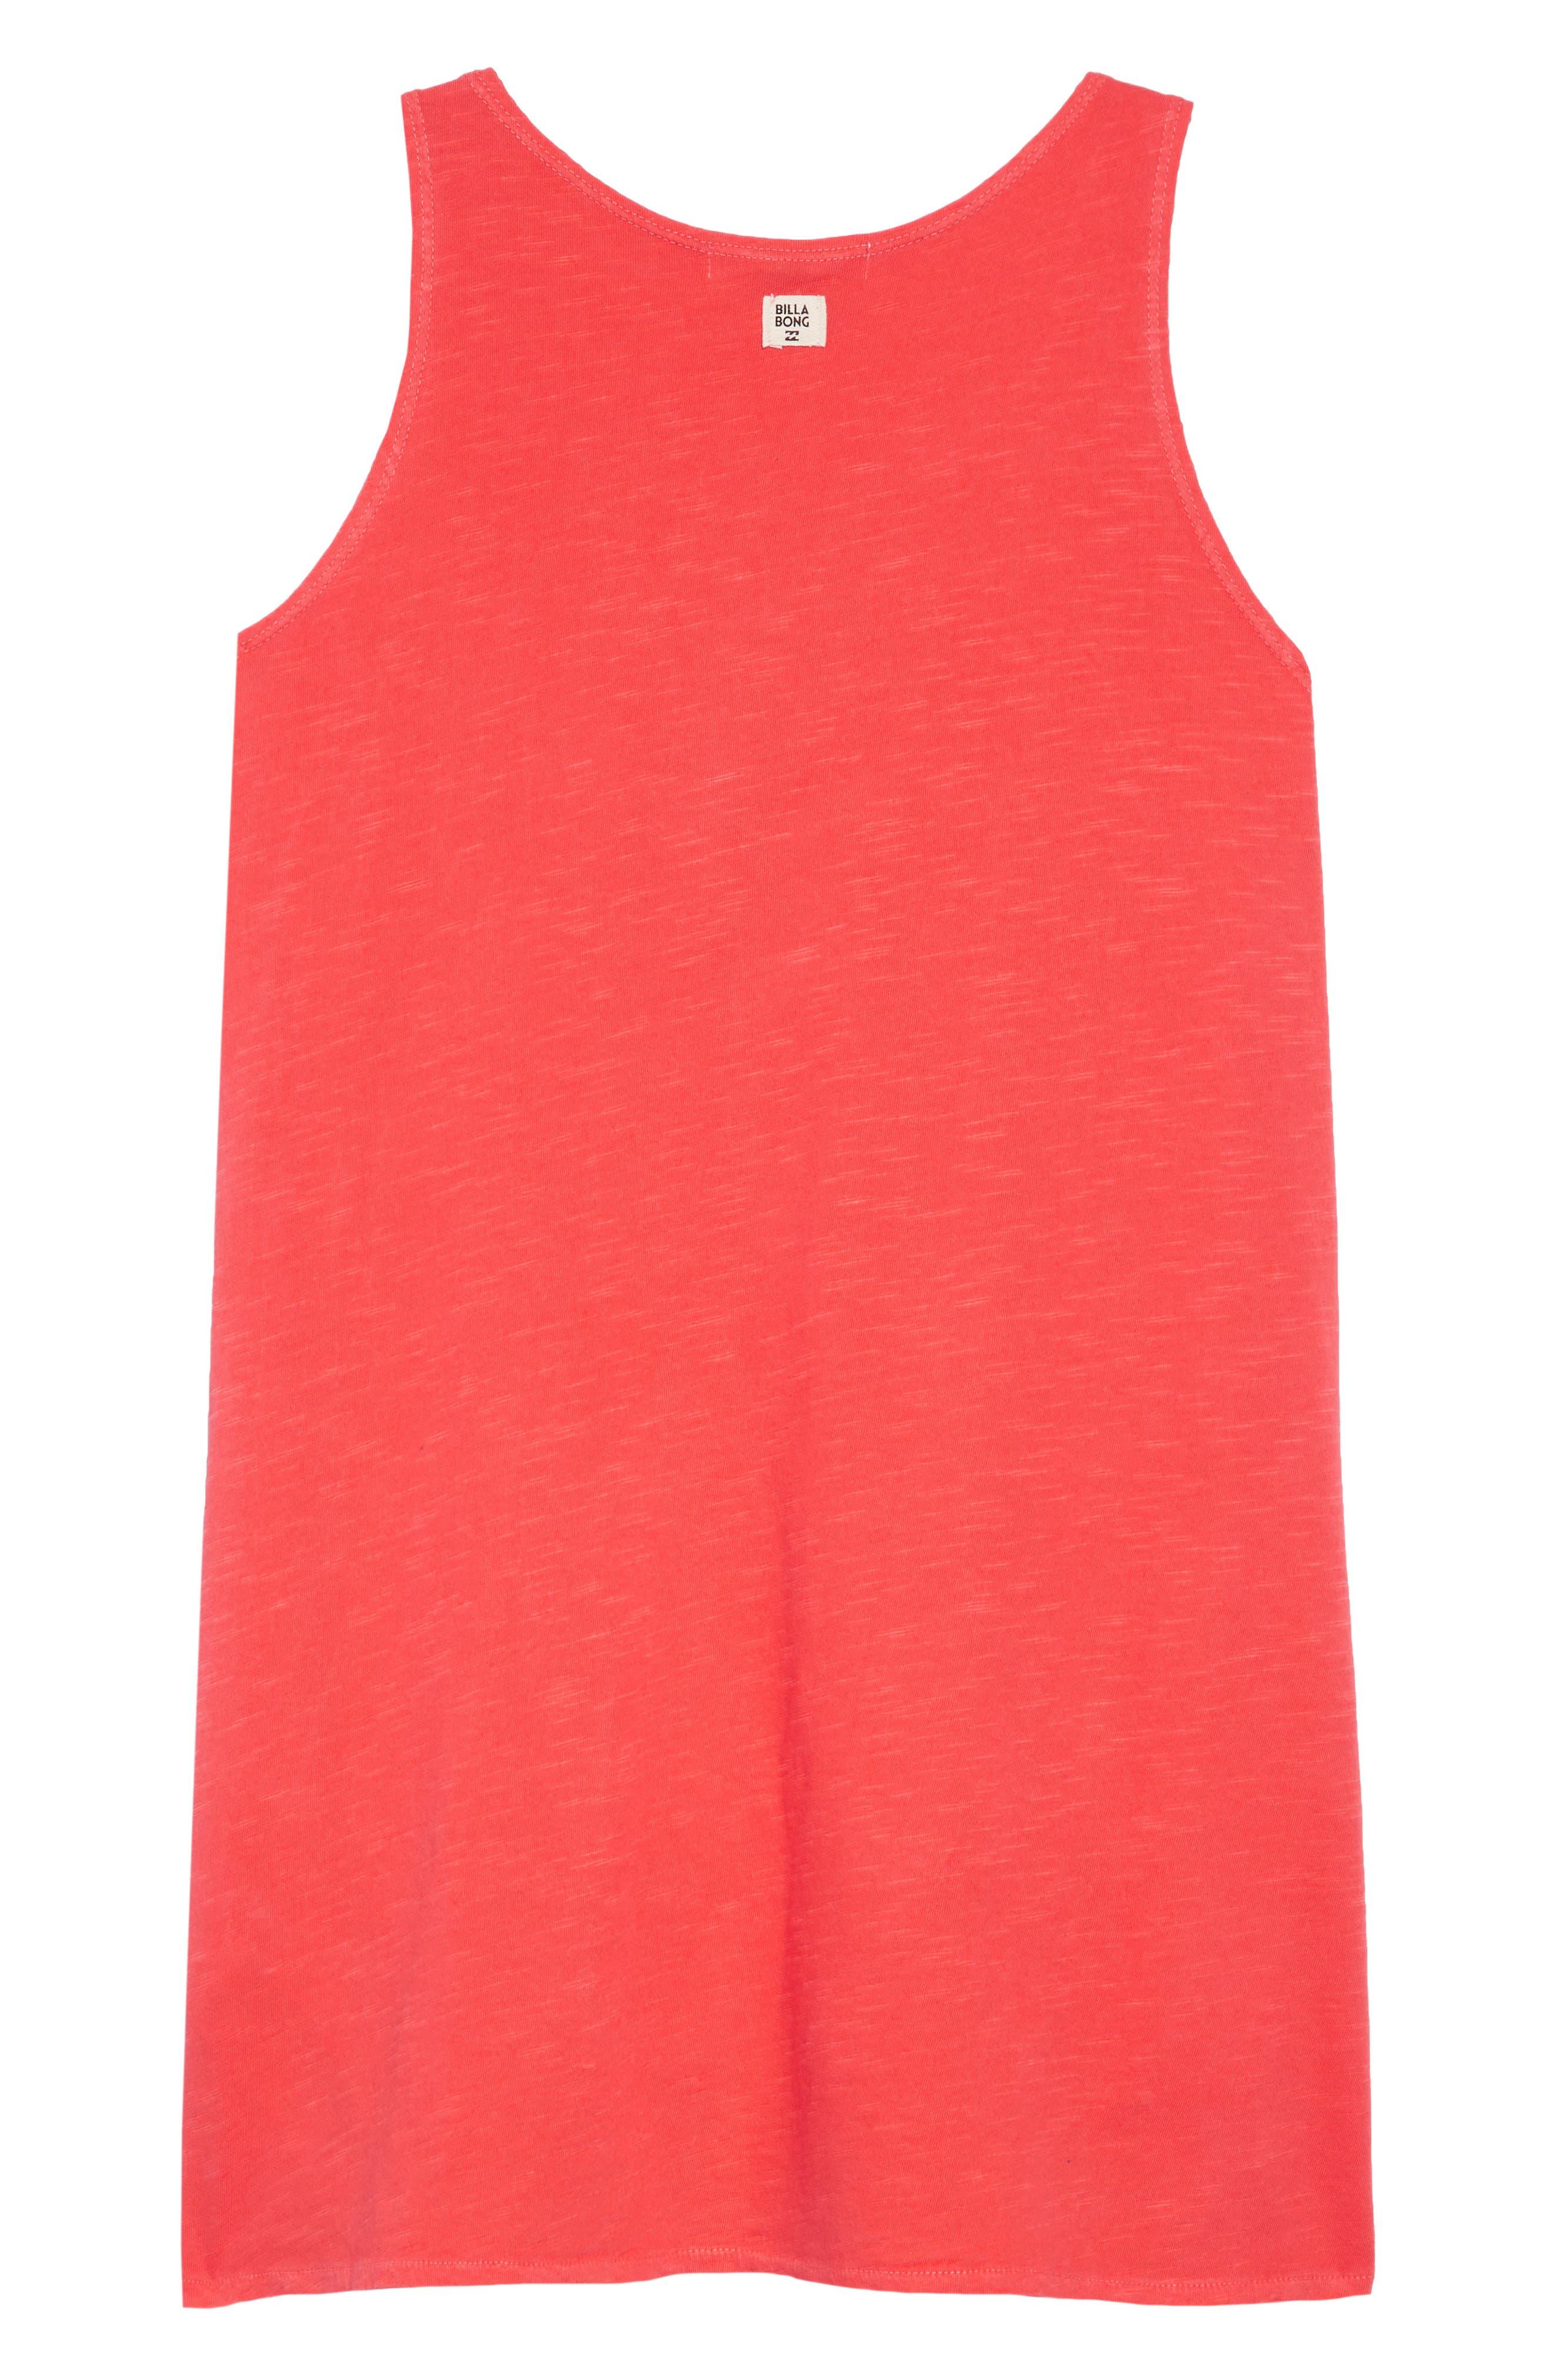 Choose You Tank Dress,                             Alternate thumbnail 2, color,                             SUNSET RED